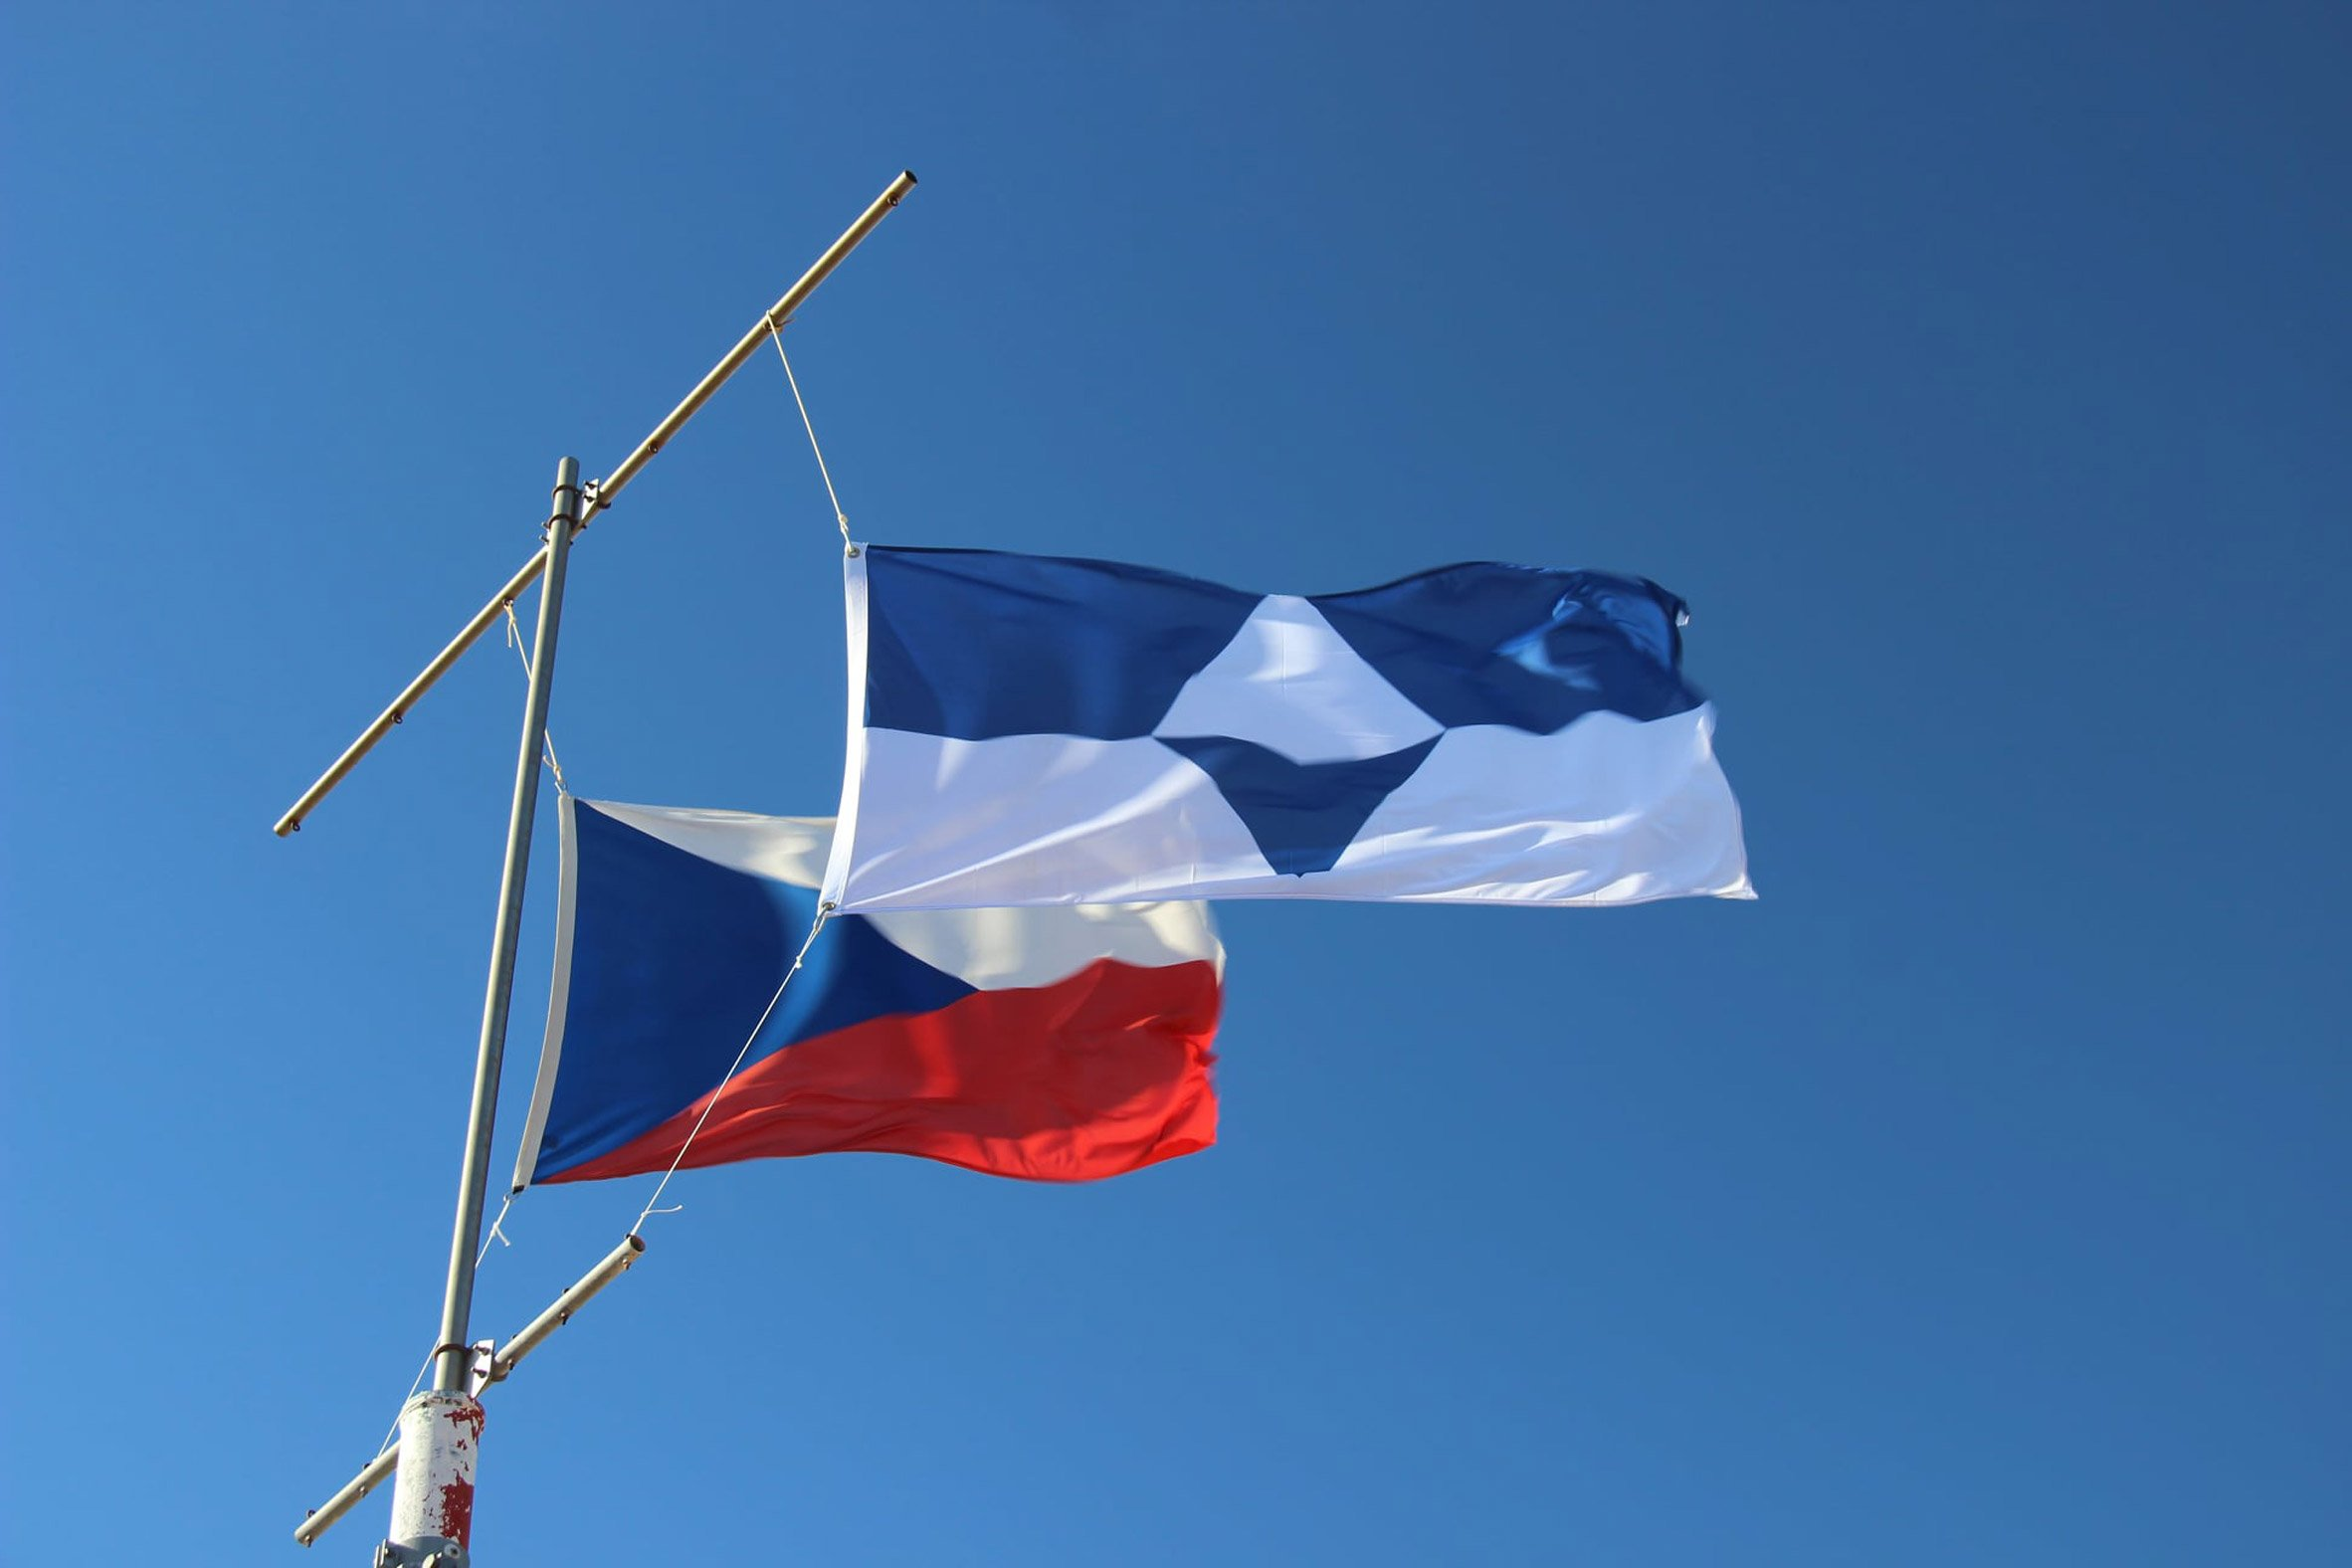 True South flag at the Czech Republic's Mendel Polar Station